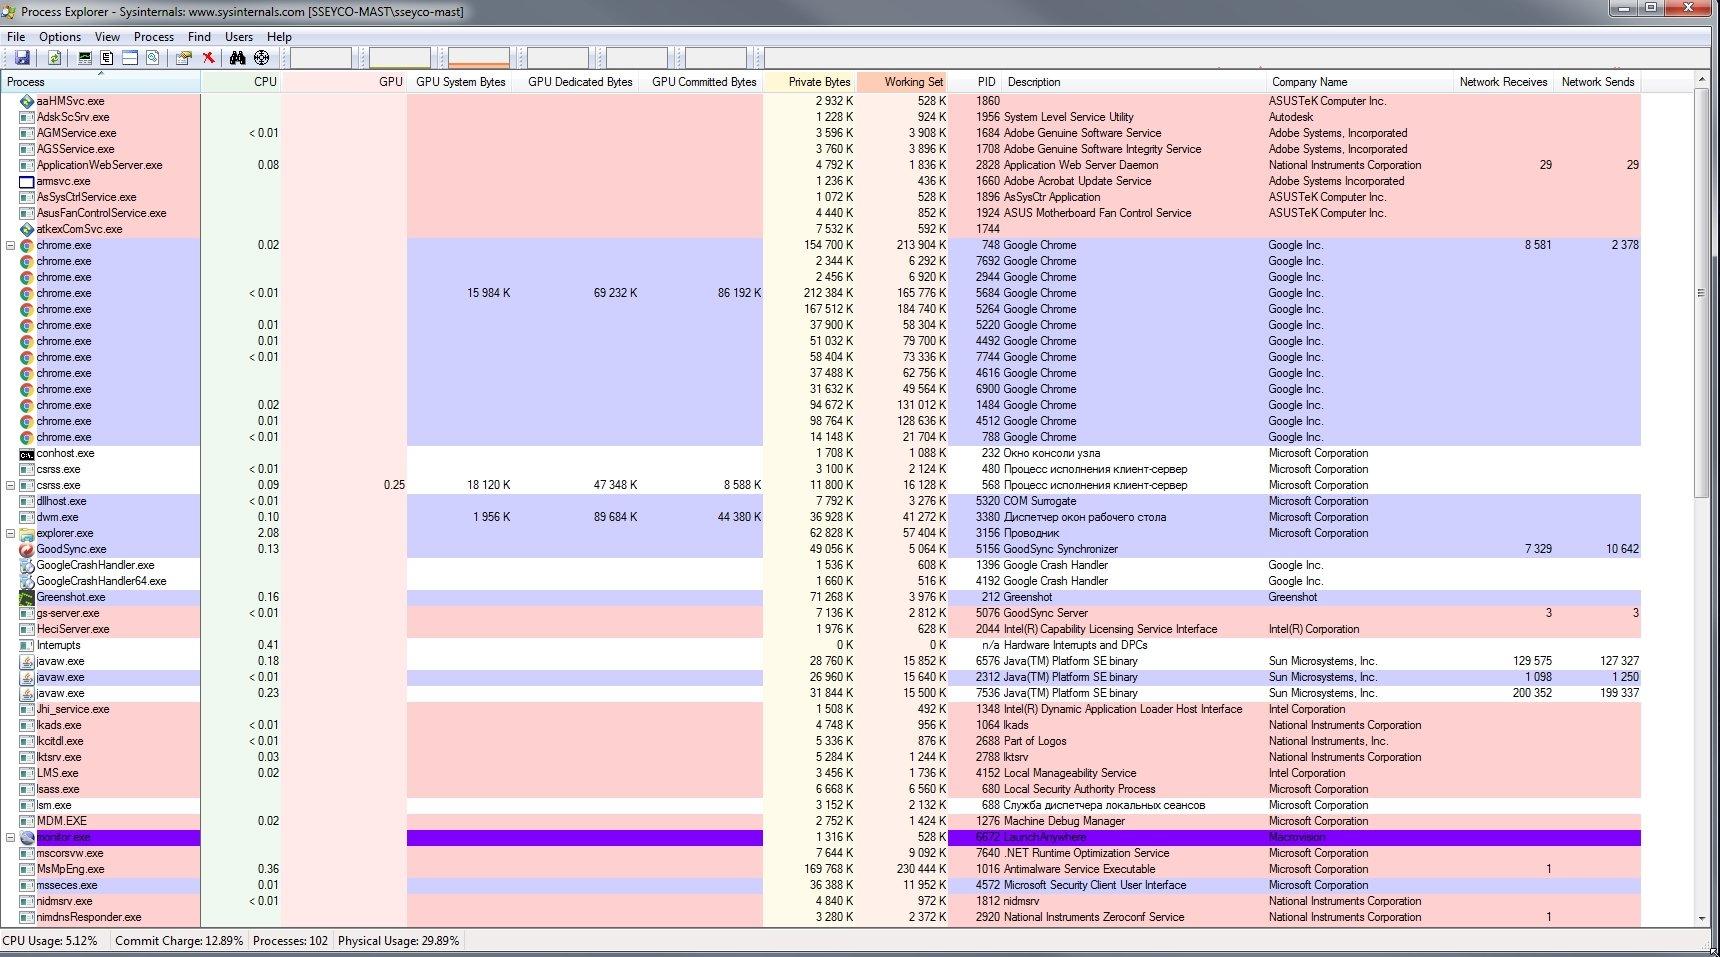 1922829823_2018-09-1822_44_11-ProcessExplorer-Sysinternals_www.sysinternals.comSSEYCO-MAST_sseyco-mast.jpg.dac88a9adf2e26785c81ae6c5aa6056b.jpg